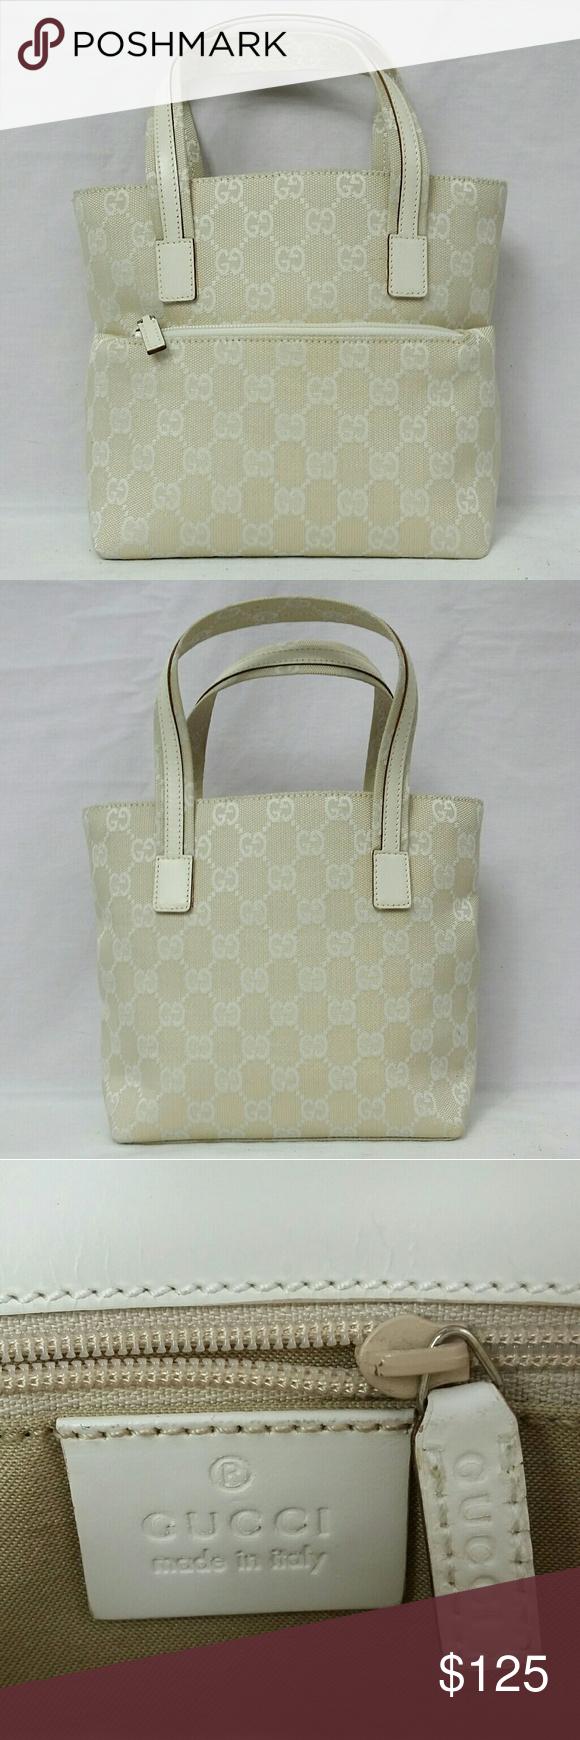 a30234a05b5 Gucci Tote Bag Ivory White Guaranteed 100% Authentic Gucci ~ Small canvas  tote bag.